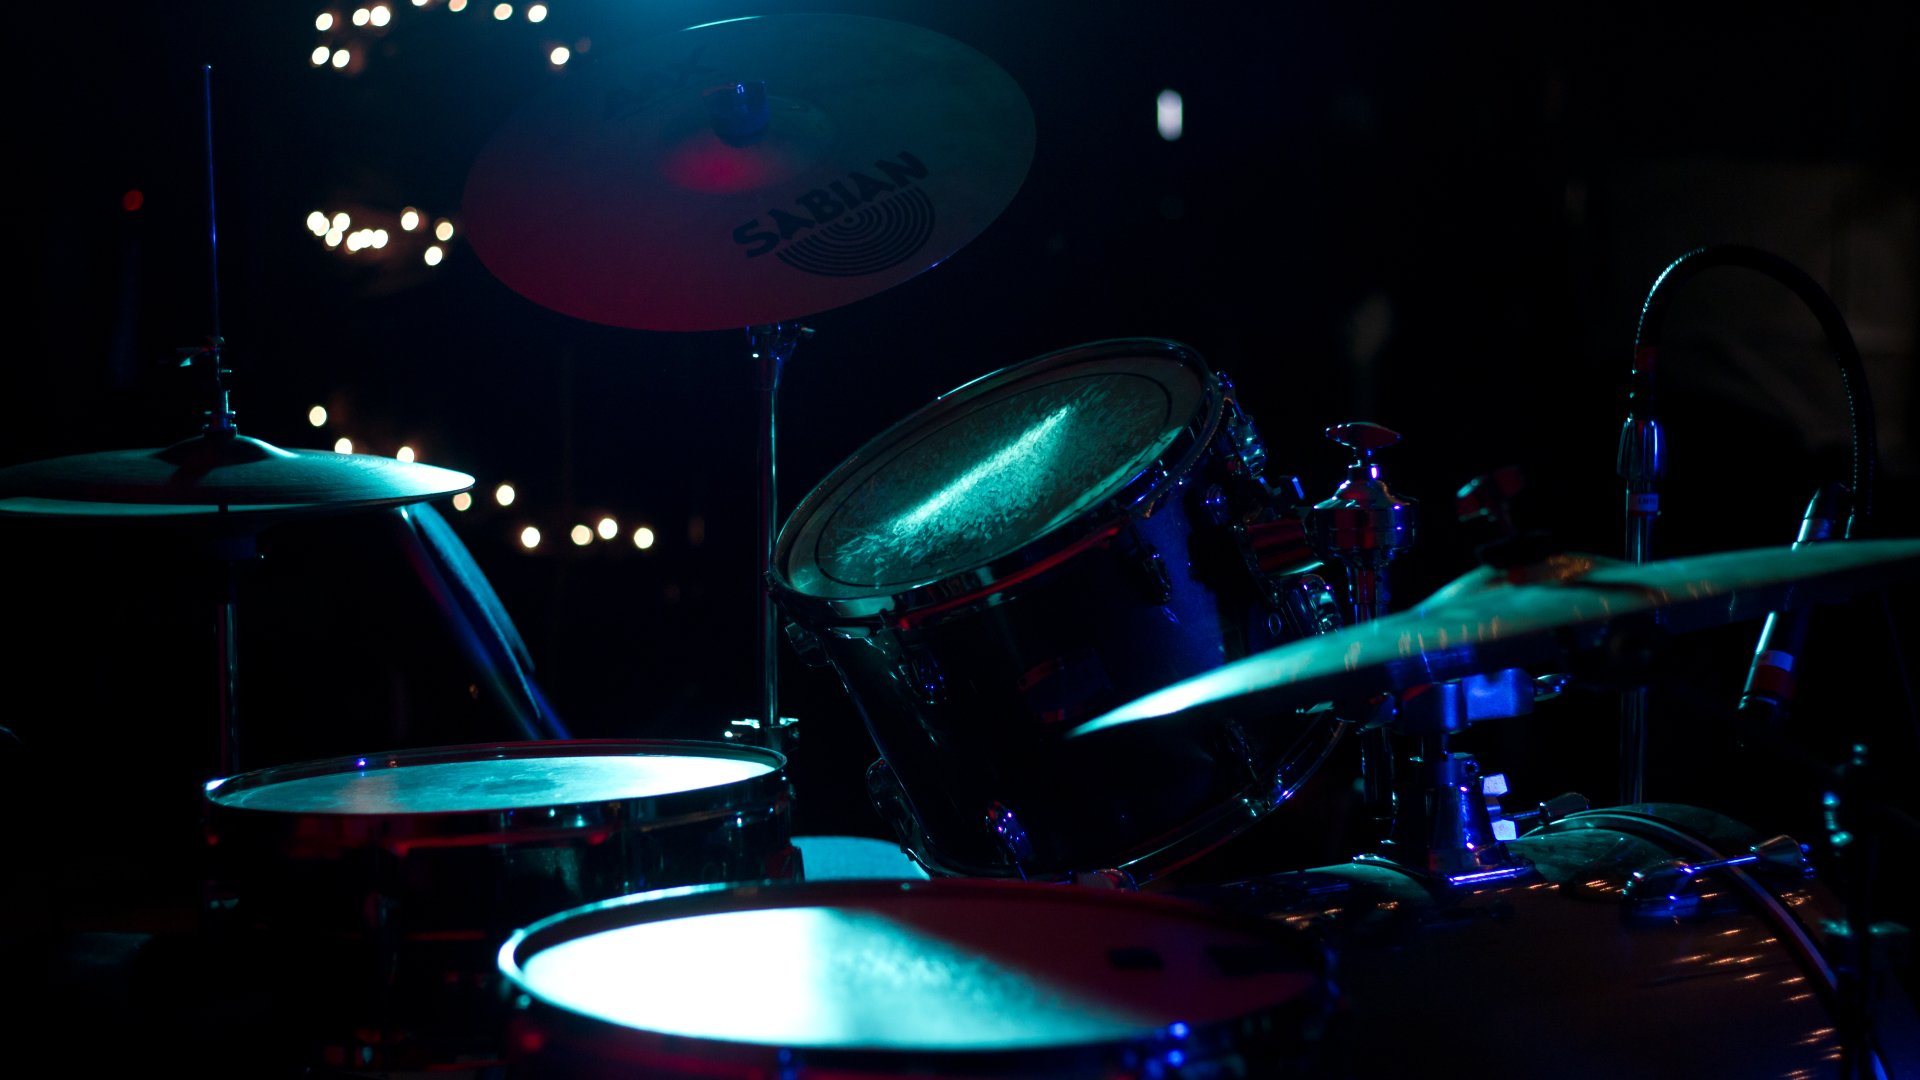 Musik - Drums  Drumset Percussion Blå Konsert Yamaha Sabian Snare Cymbal Bakgrund